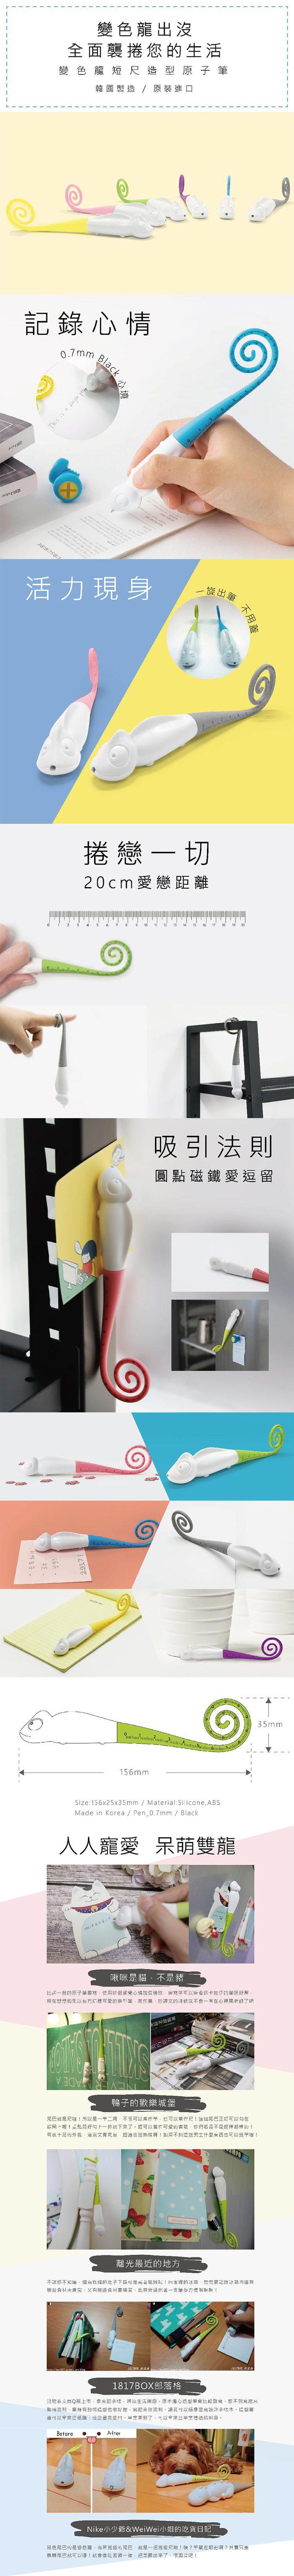 TOYOYO|變色龍短尺造型原子筆 - 水藍